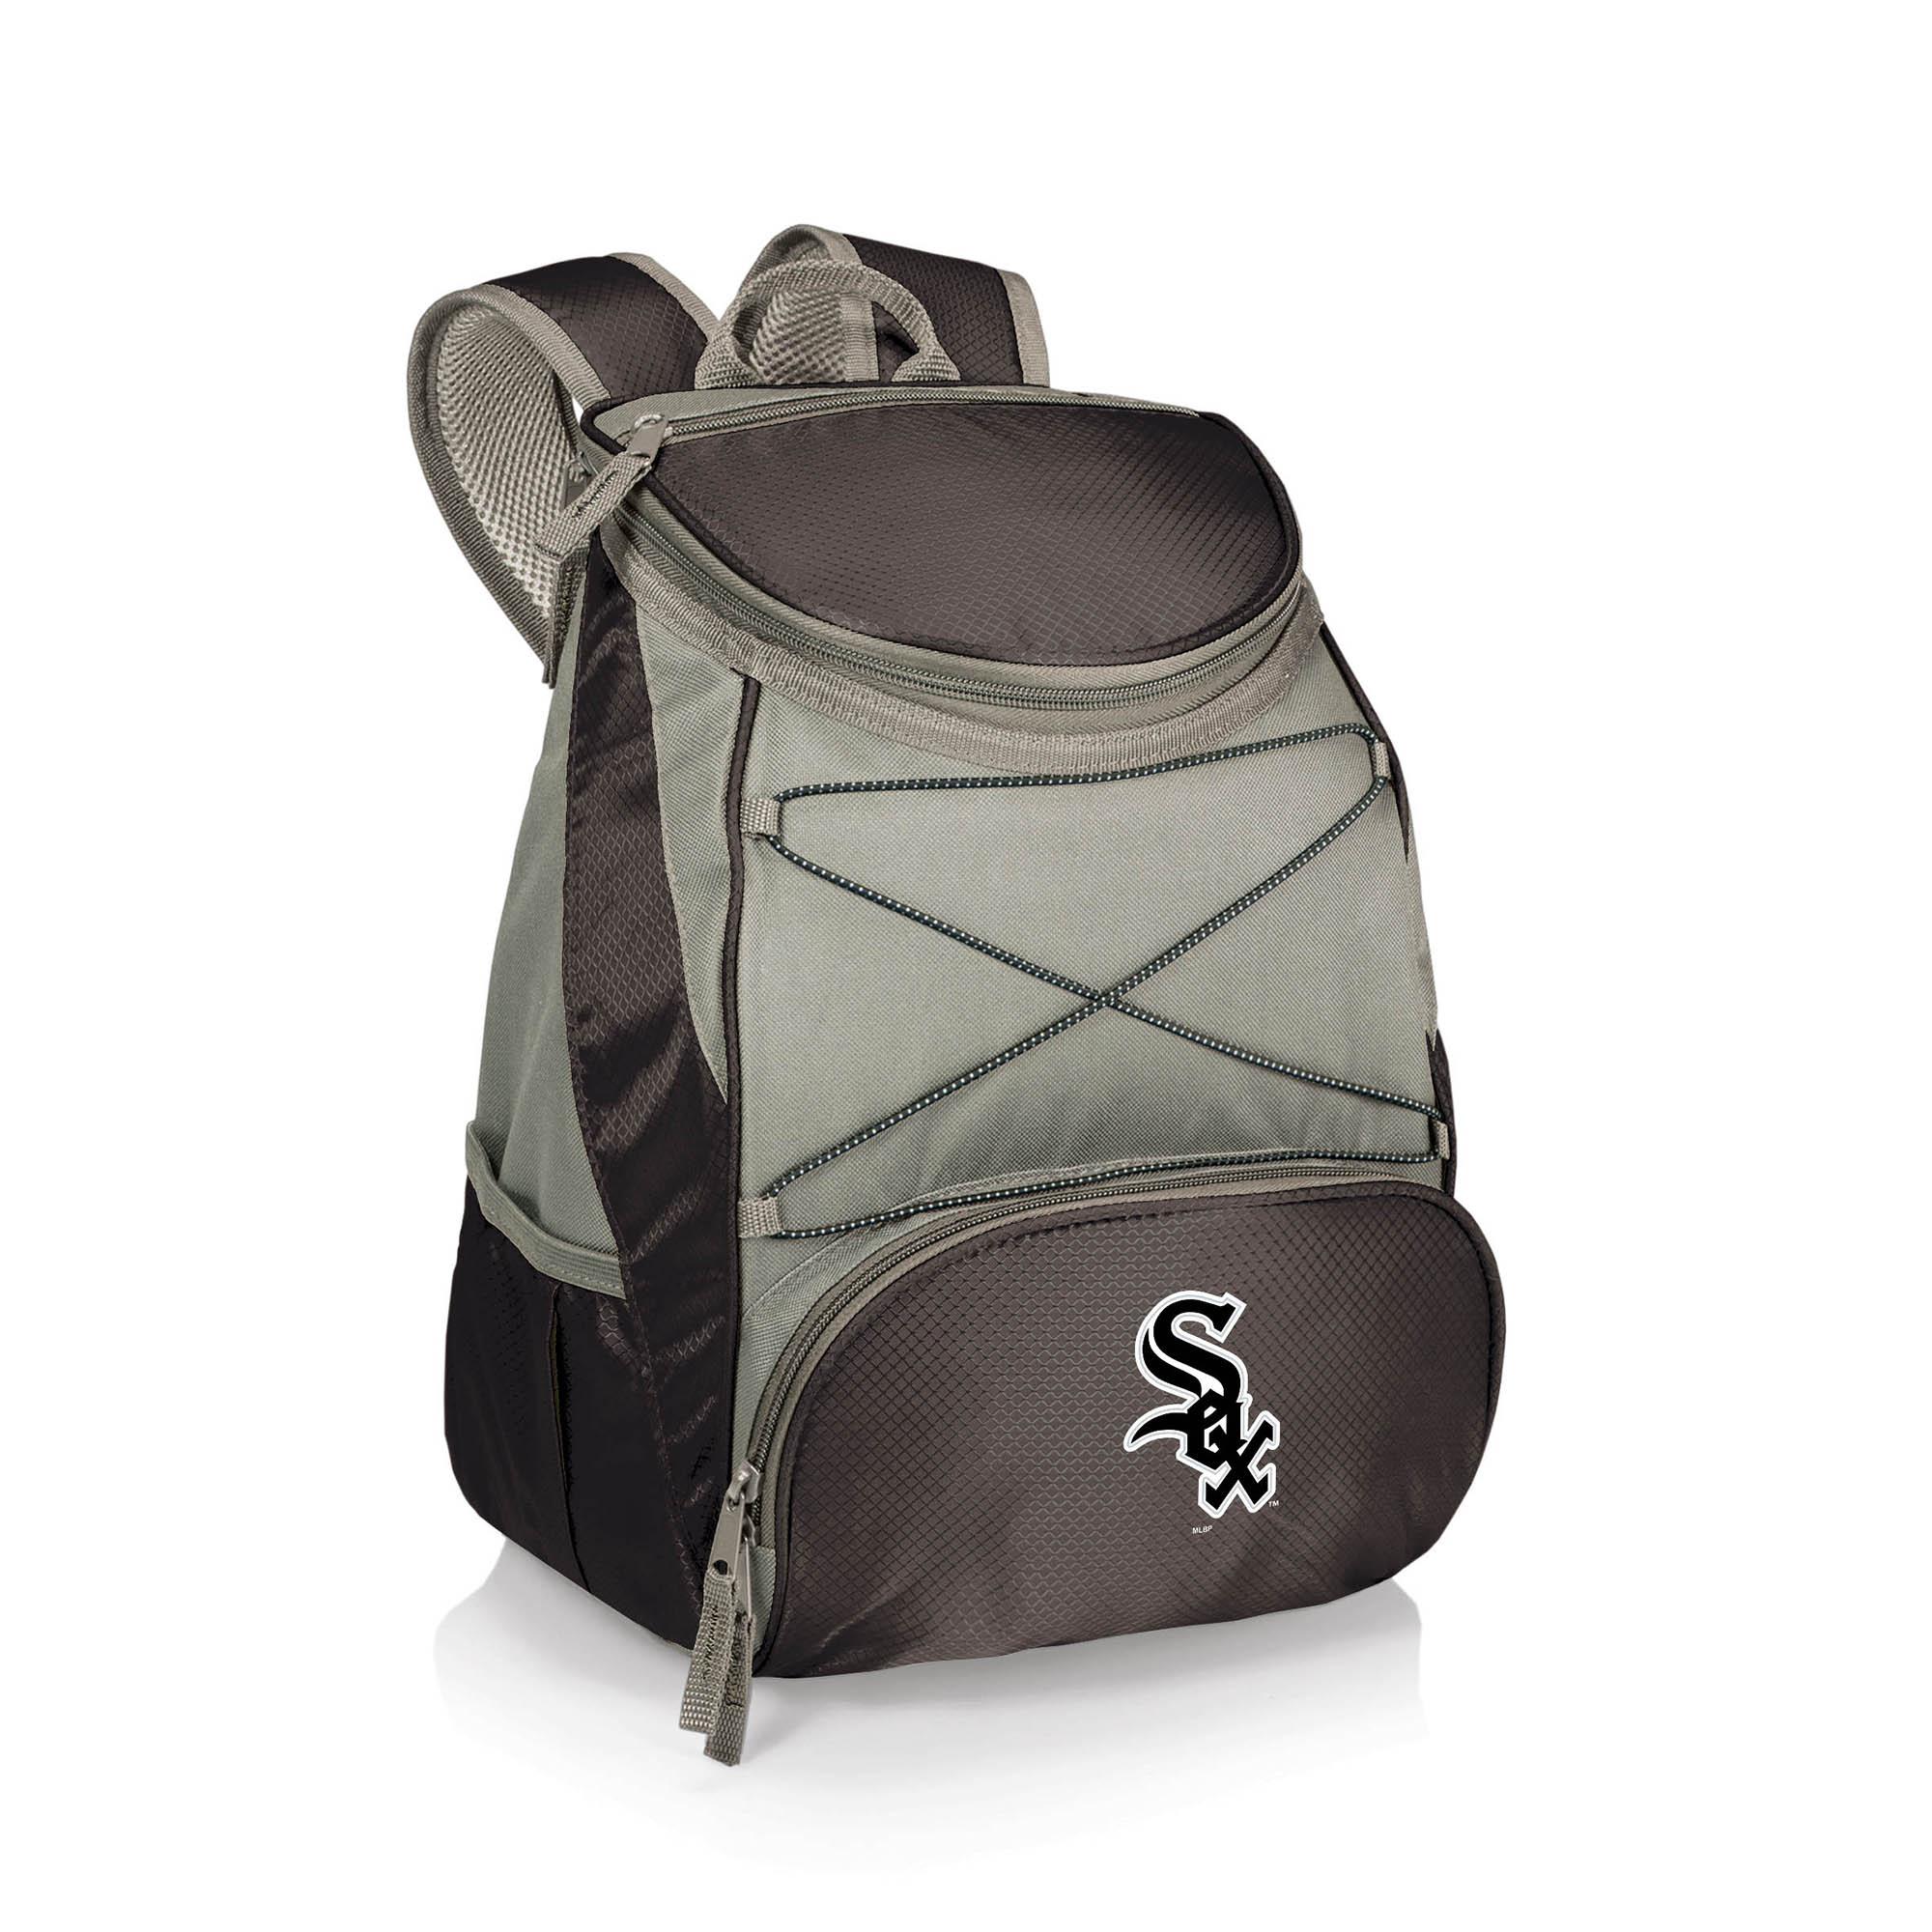 Chicago White Sox PTX Backpack Cooler - Black - No Size